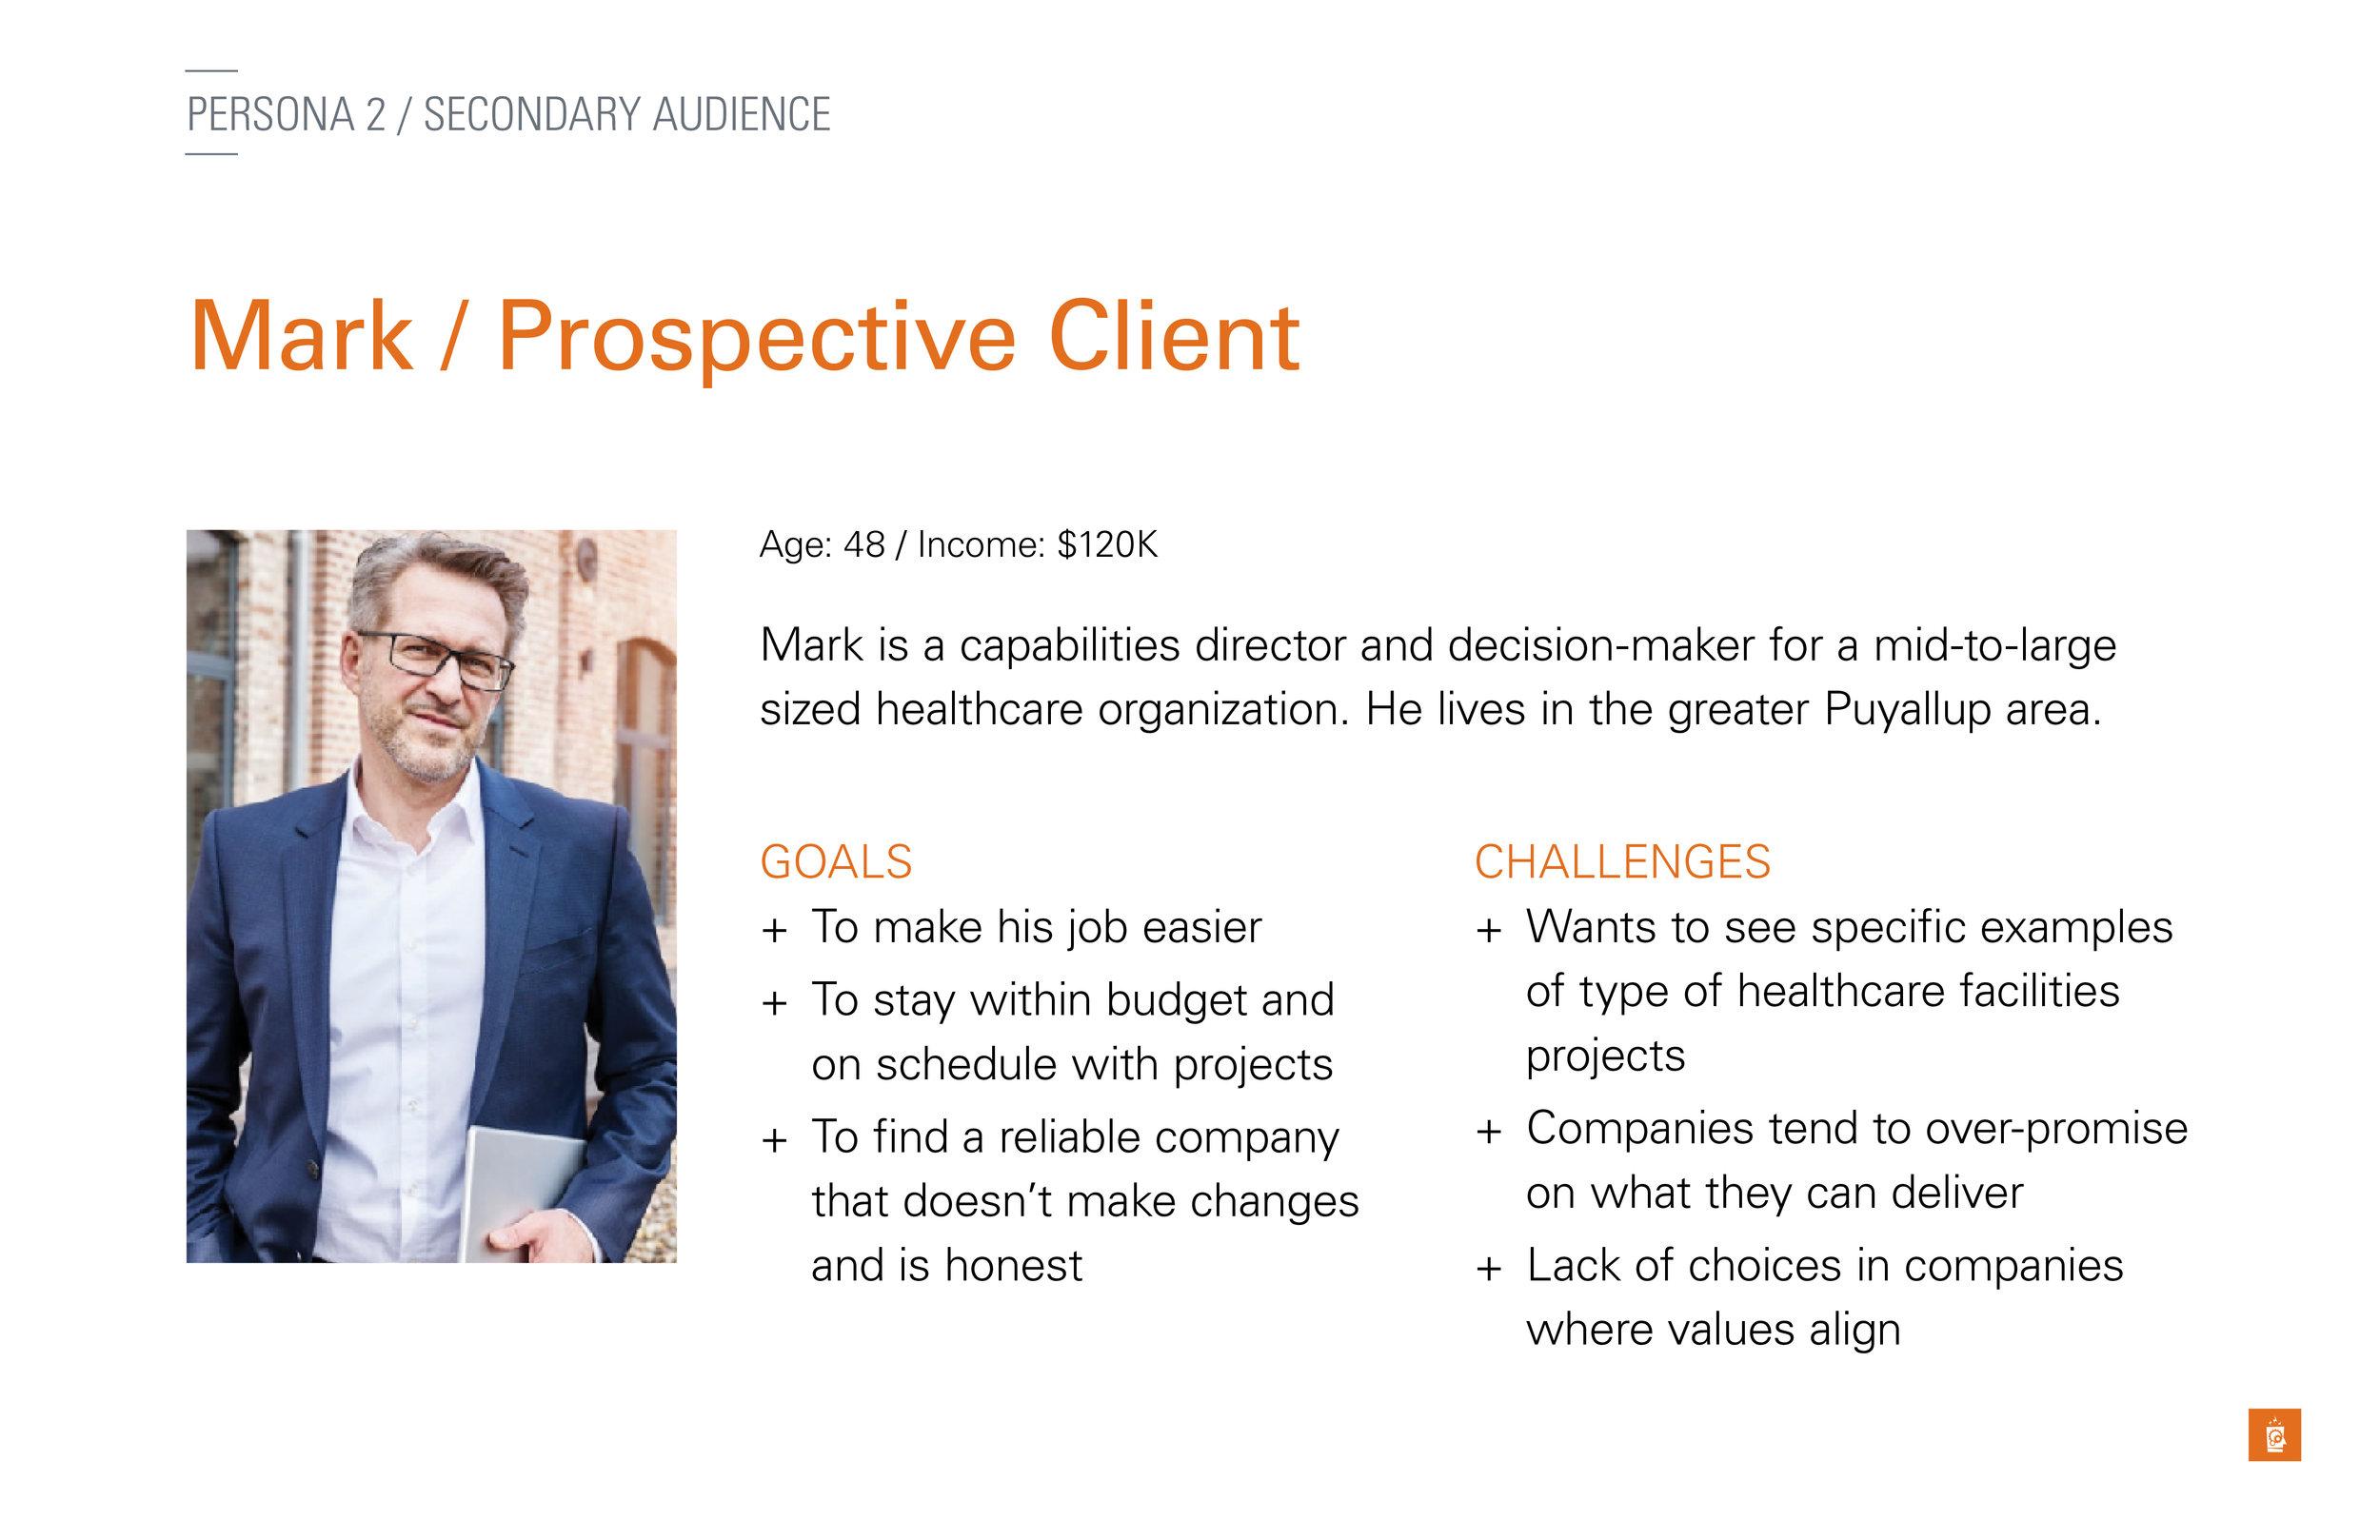 Mark, the Prospective Client persona